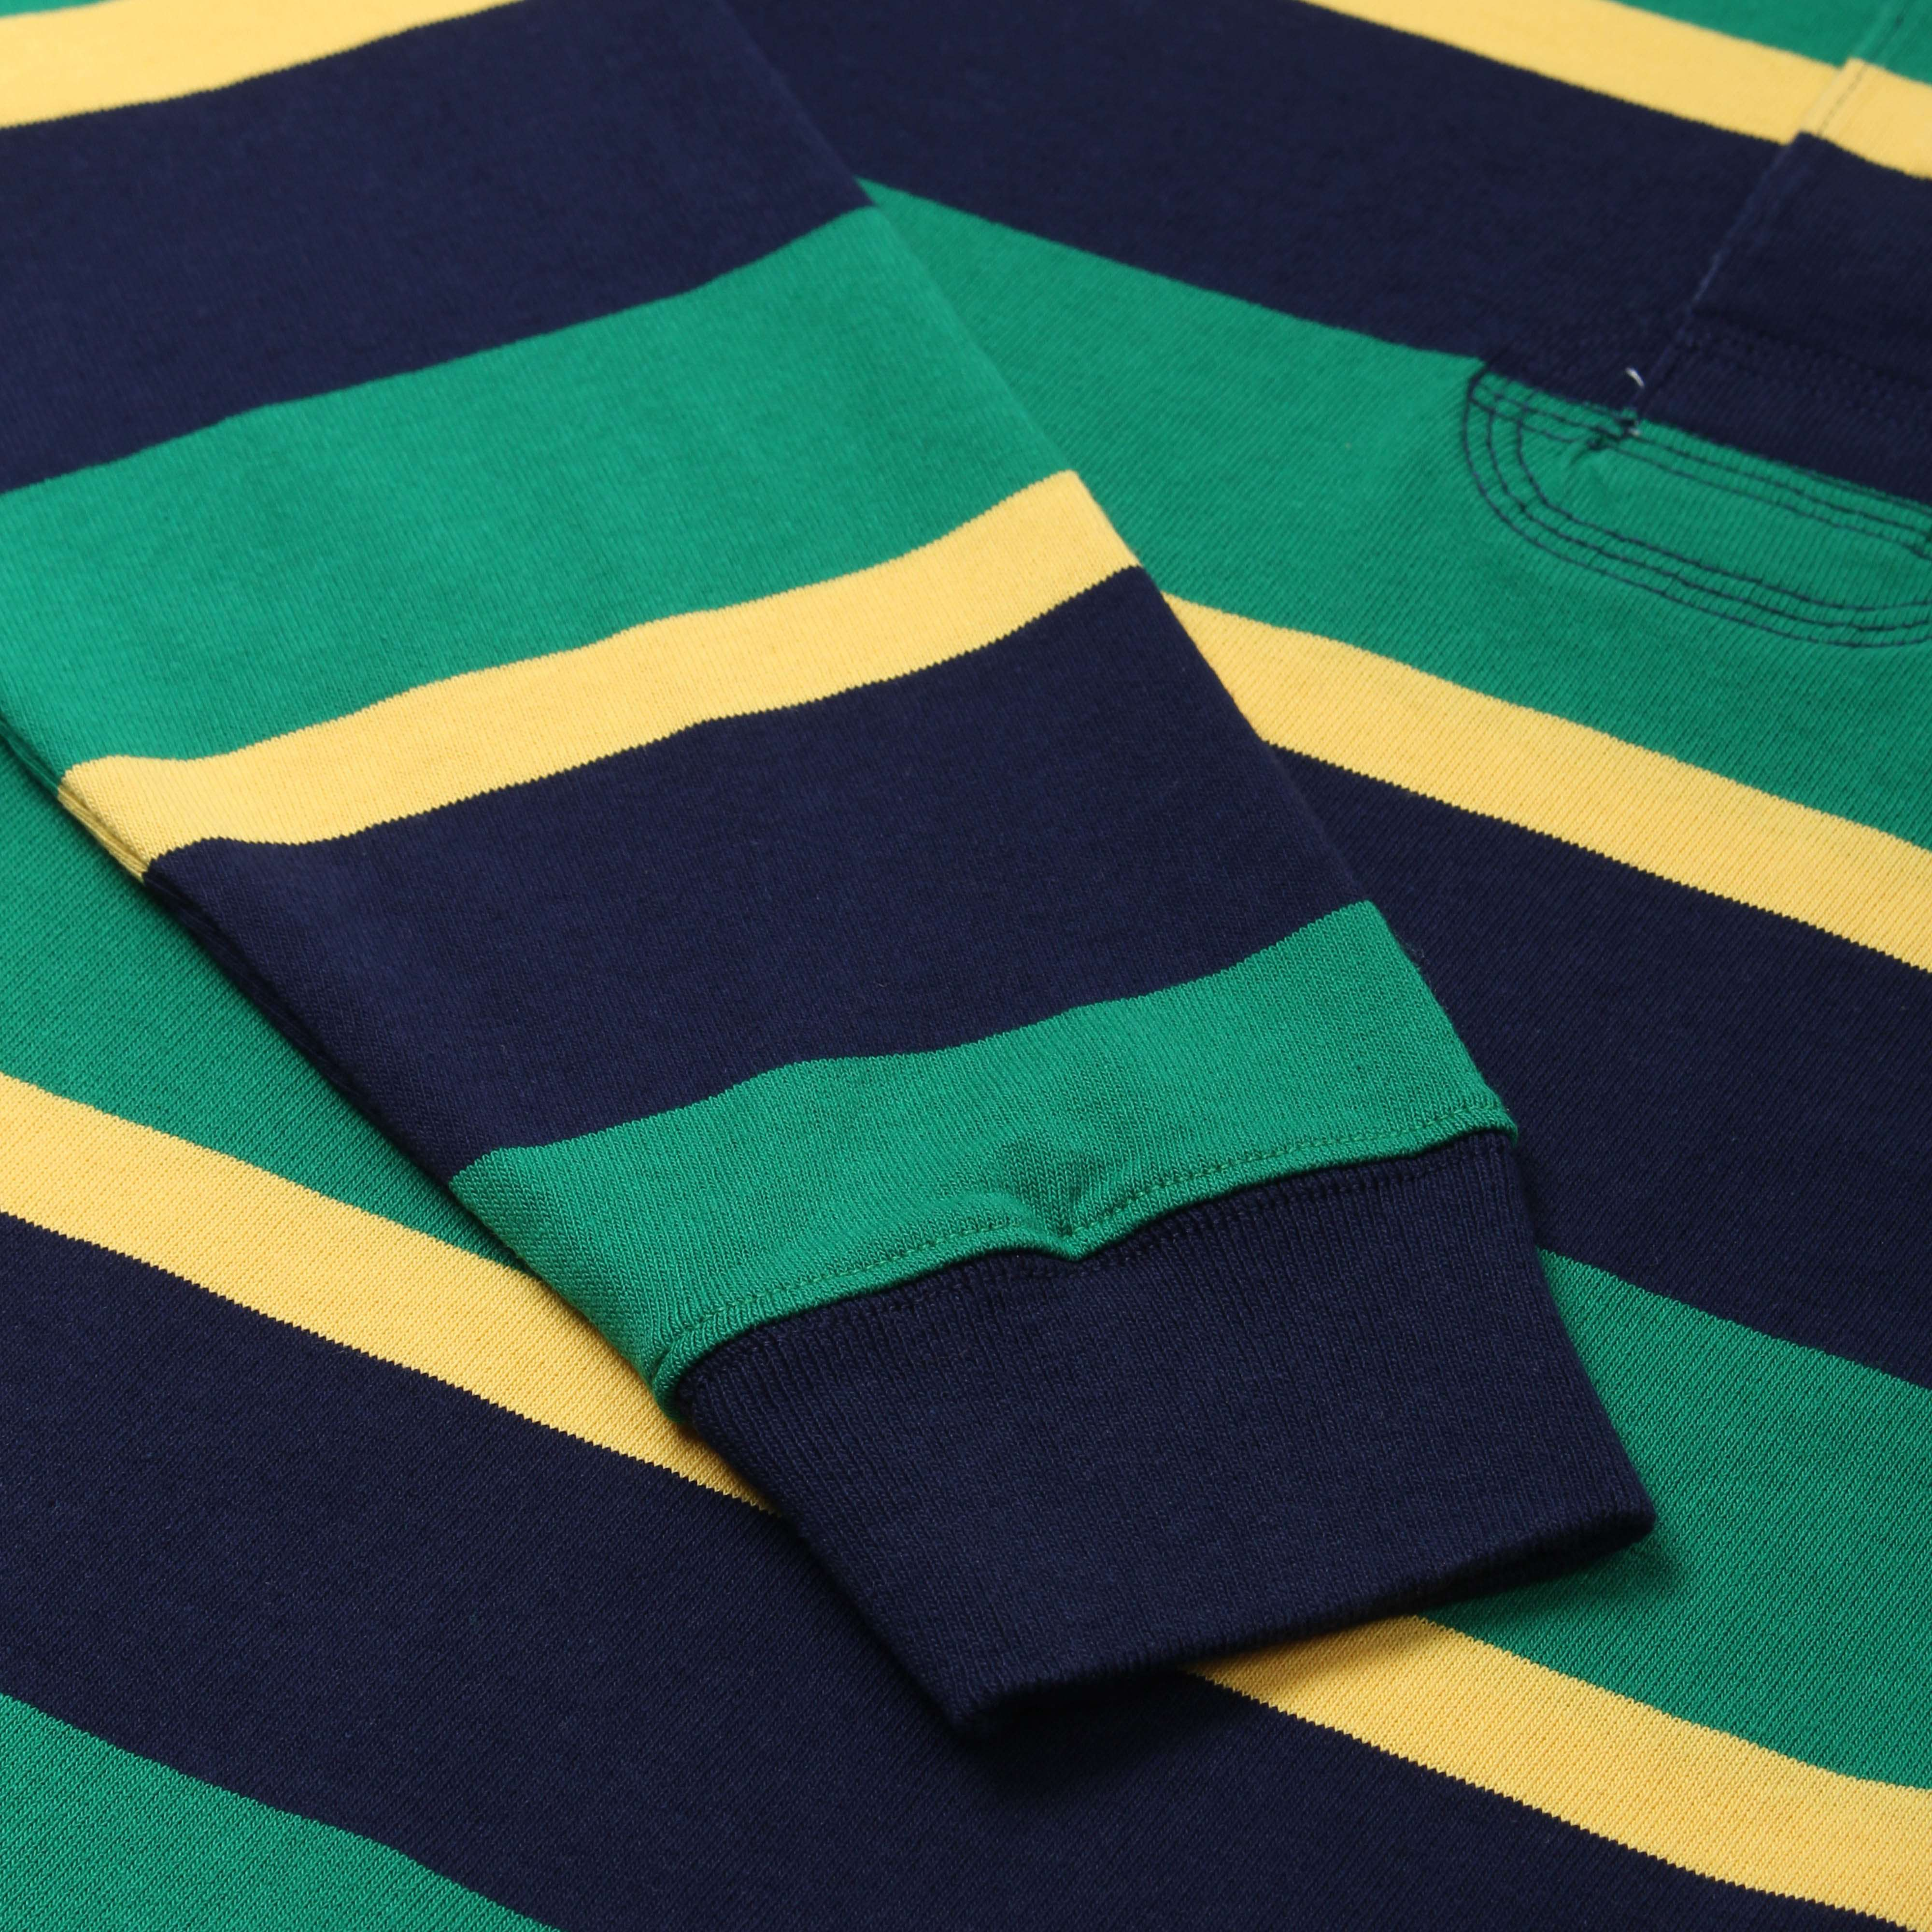 Polo Ralph Lauren Rustic Knit